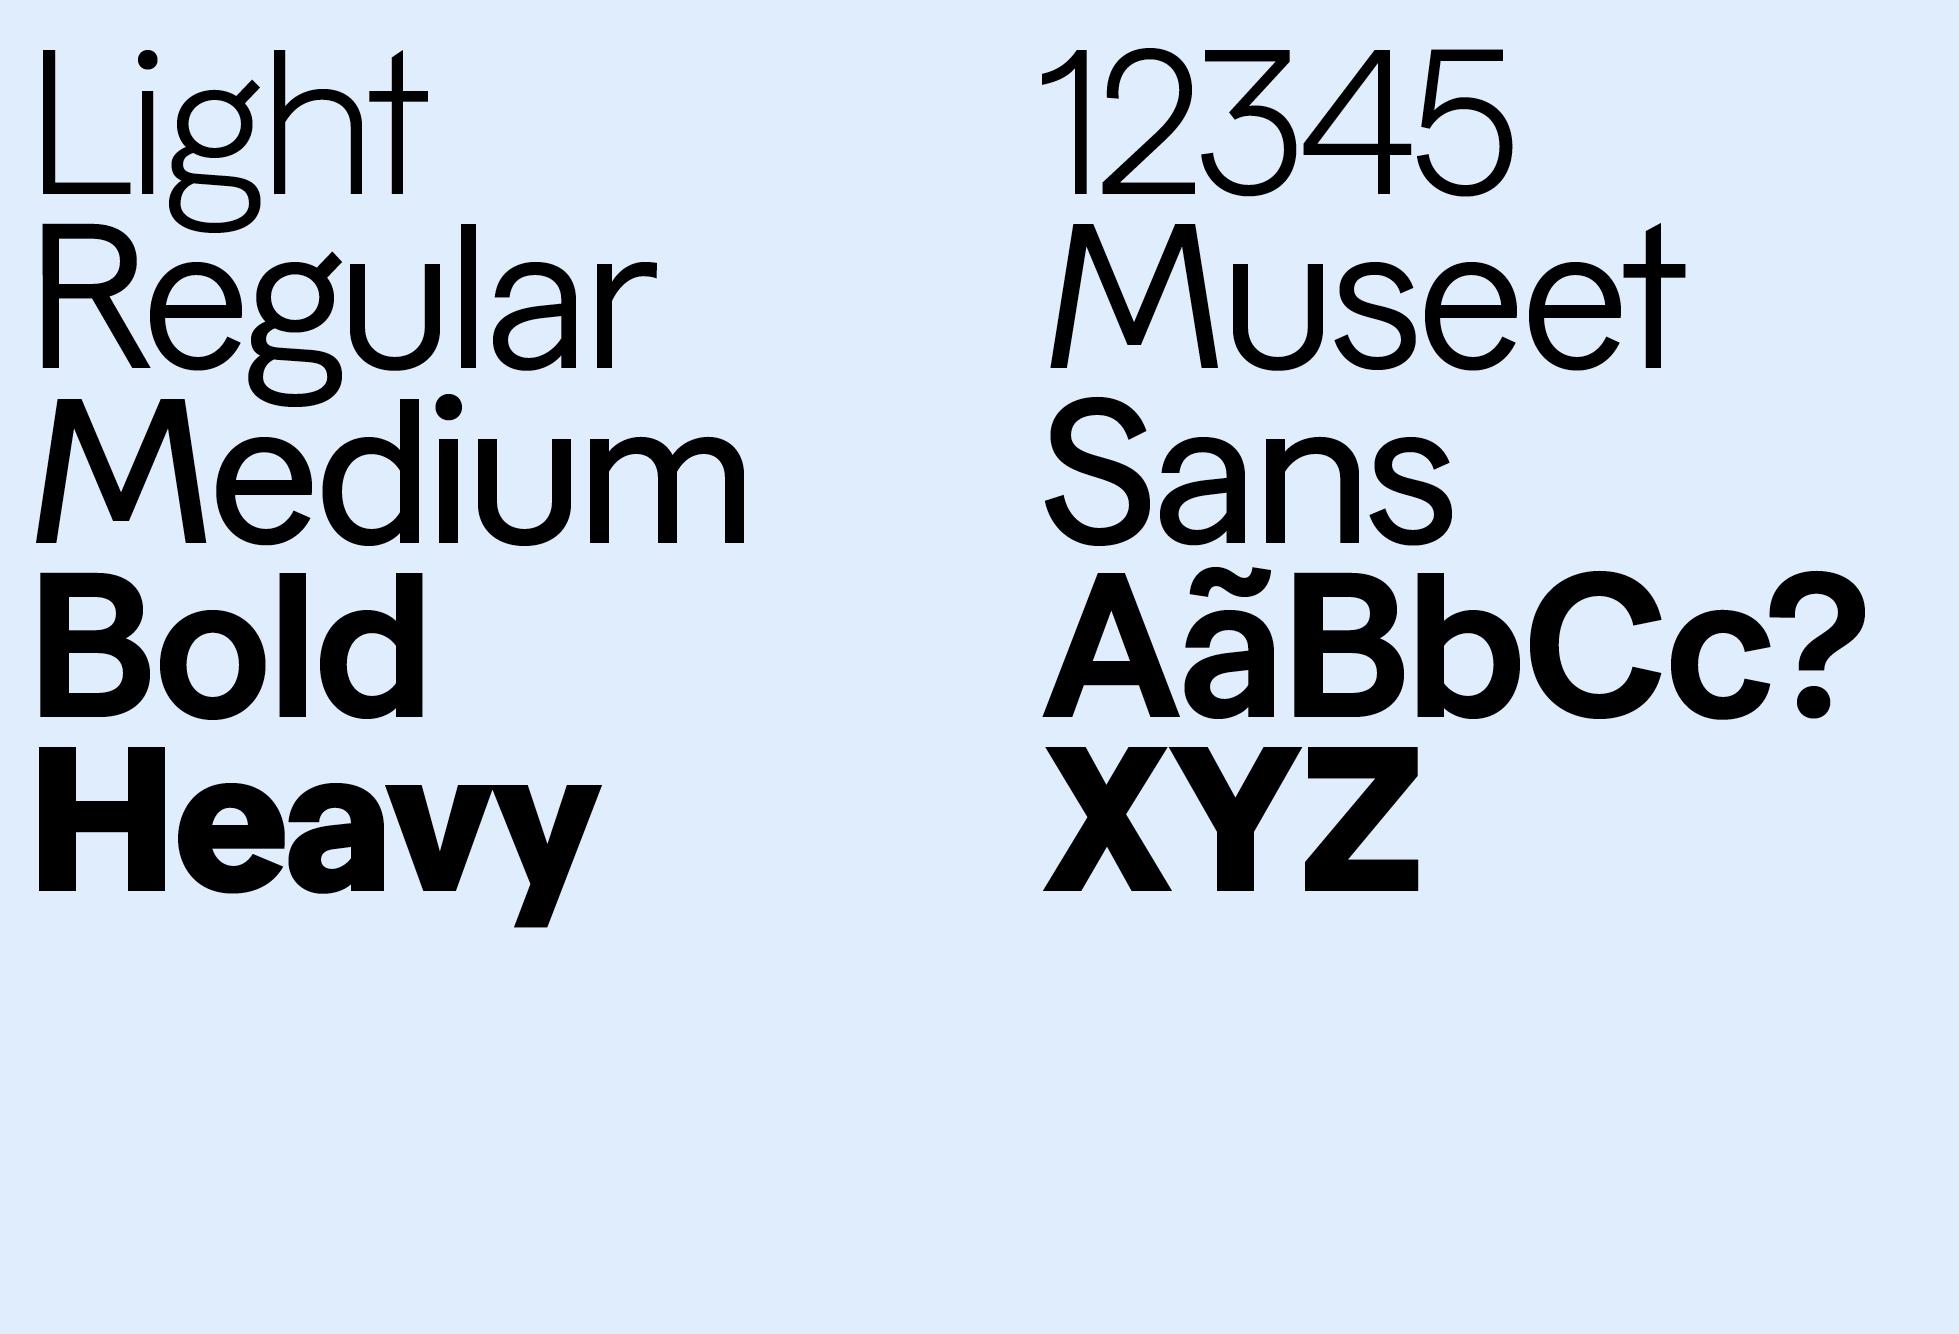 Museet Sans (Weights & Styles)